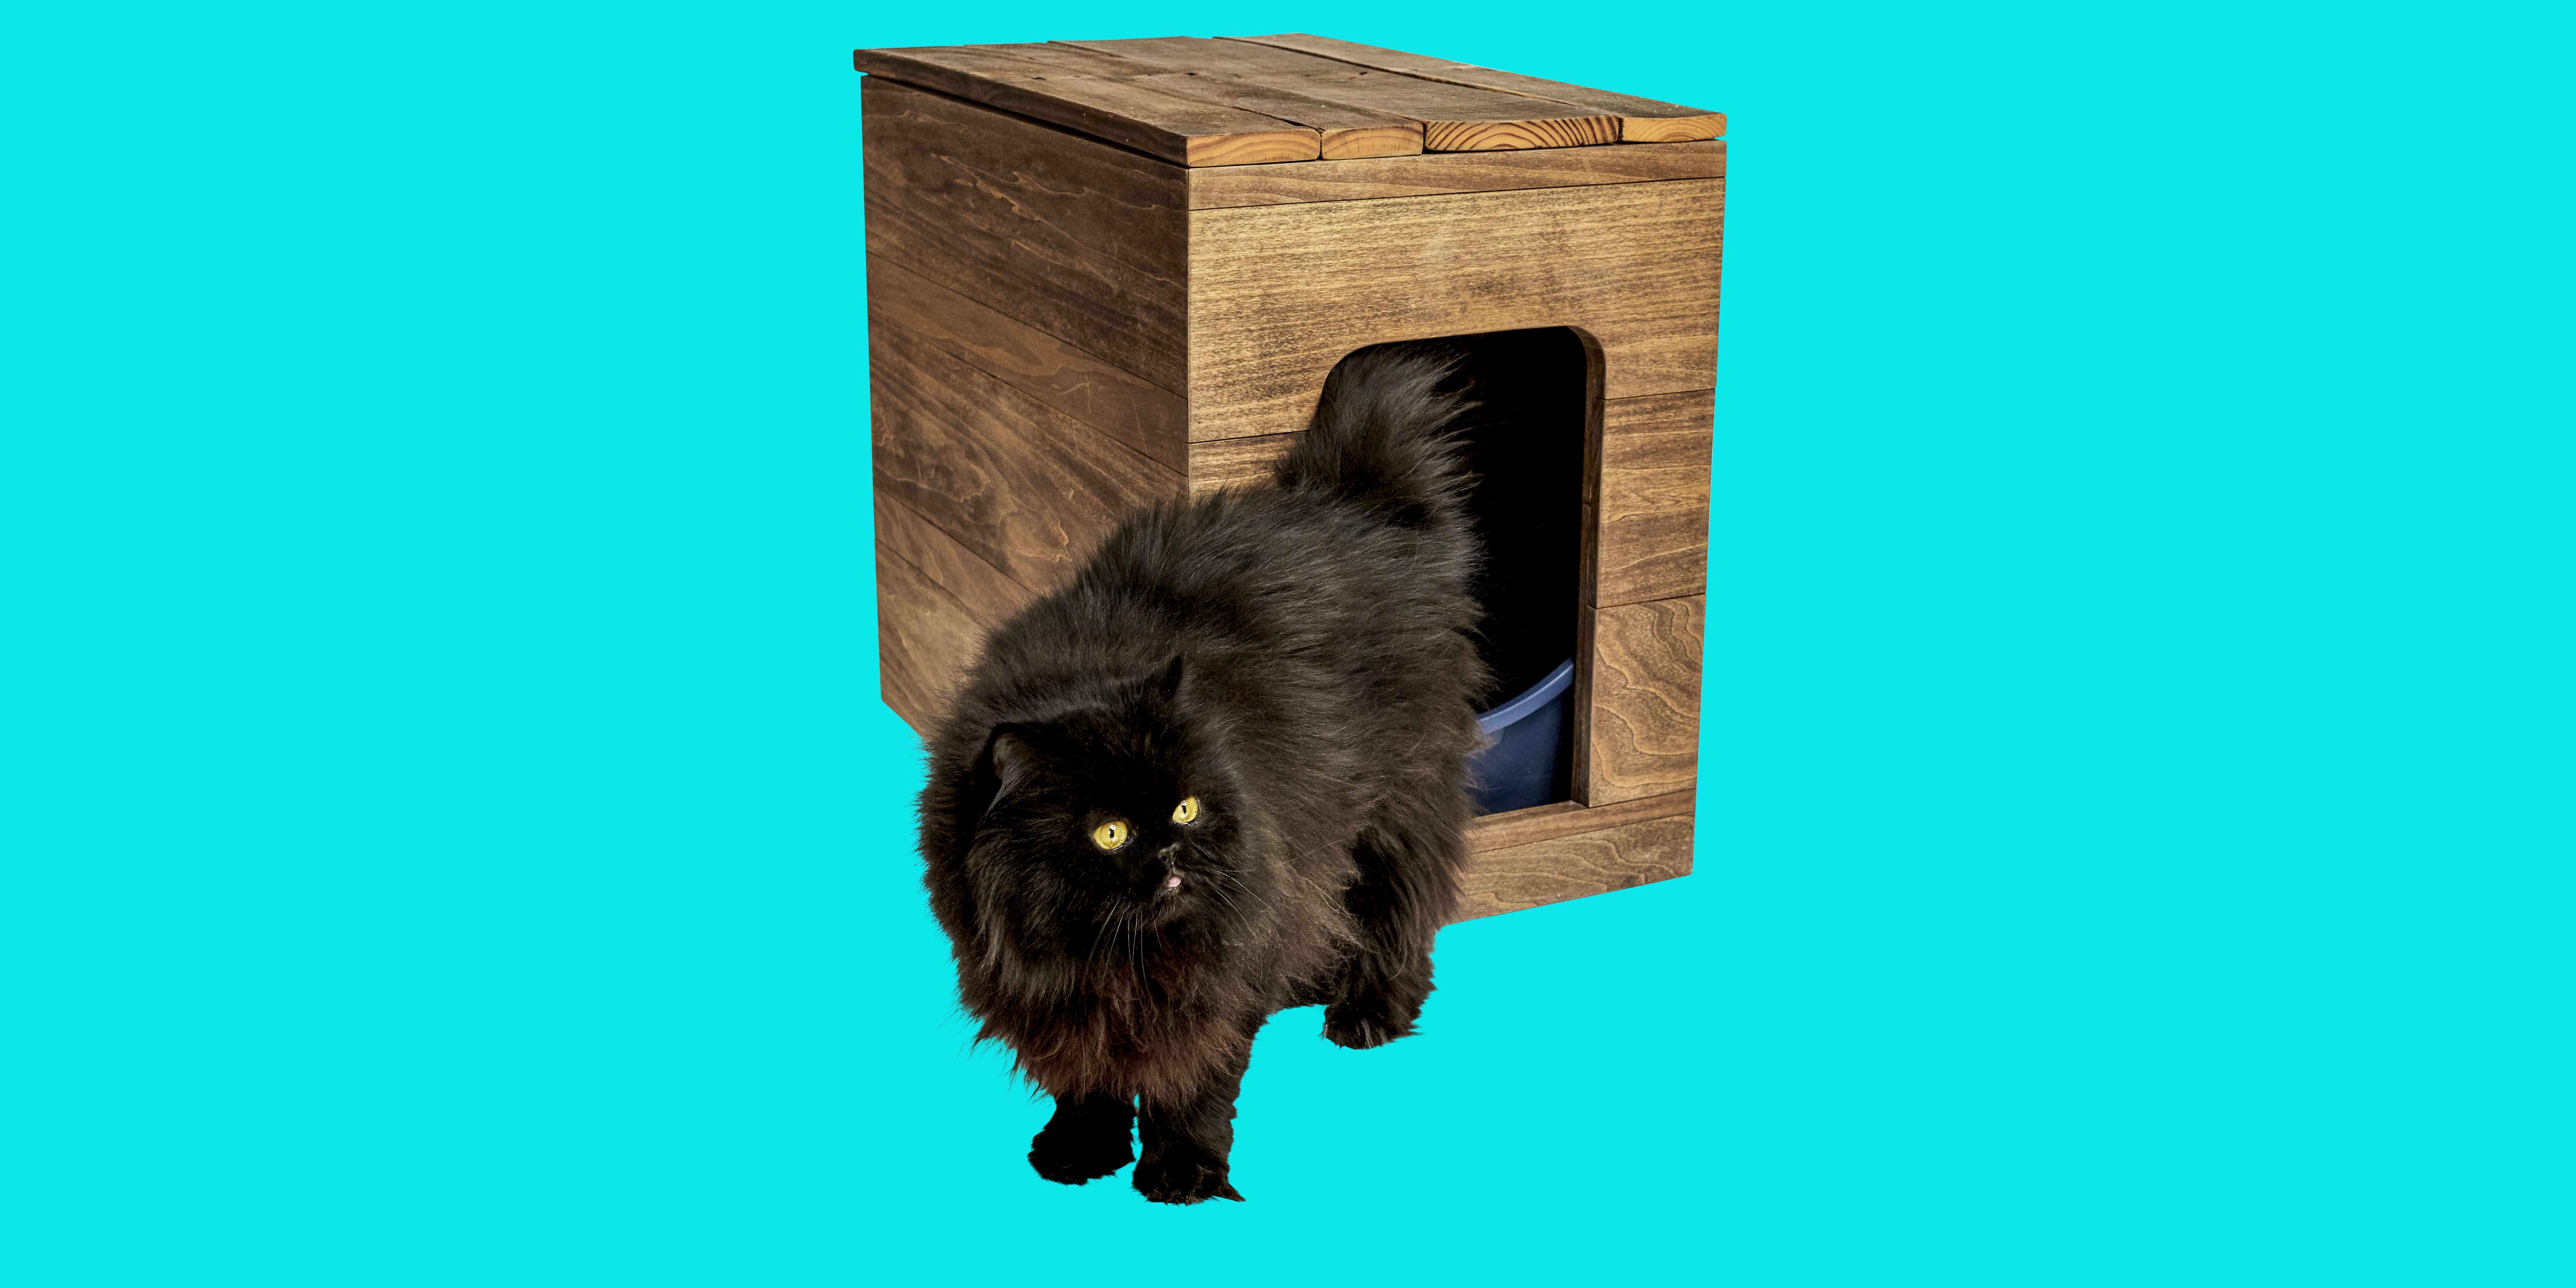 Make Your Own Cat Litter Box